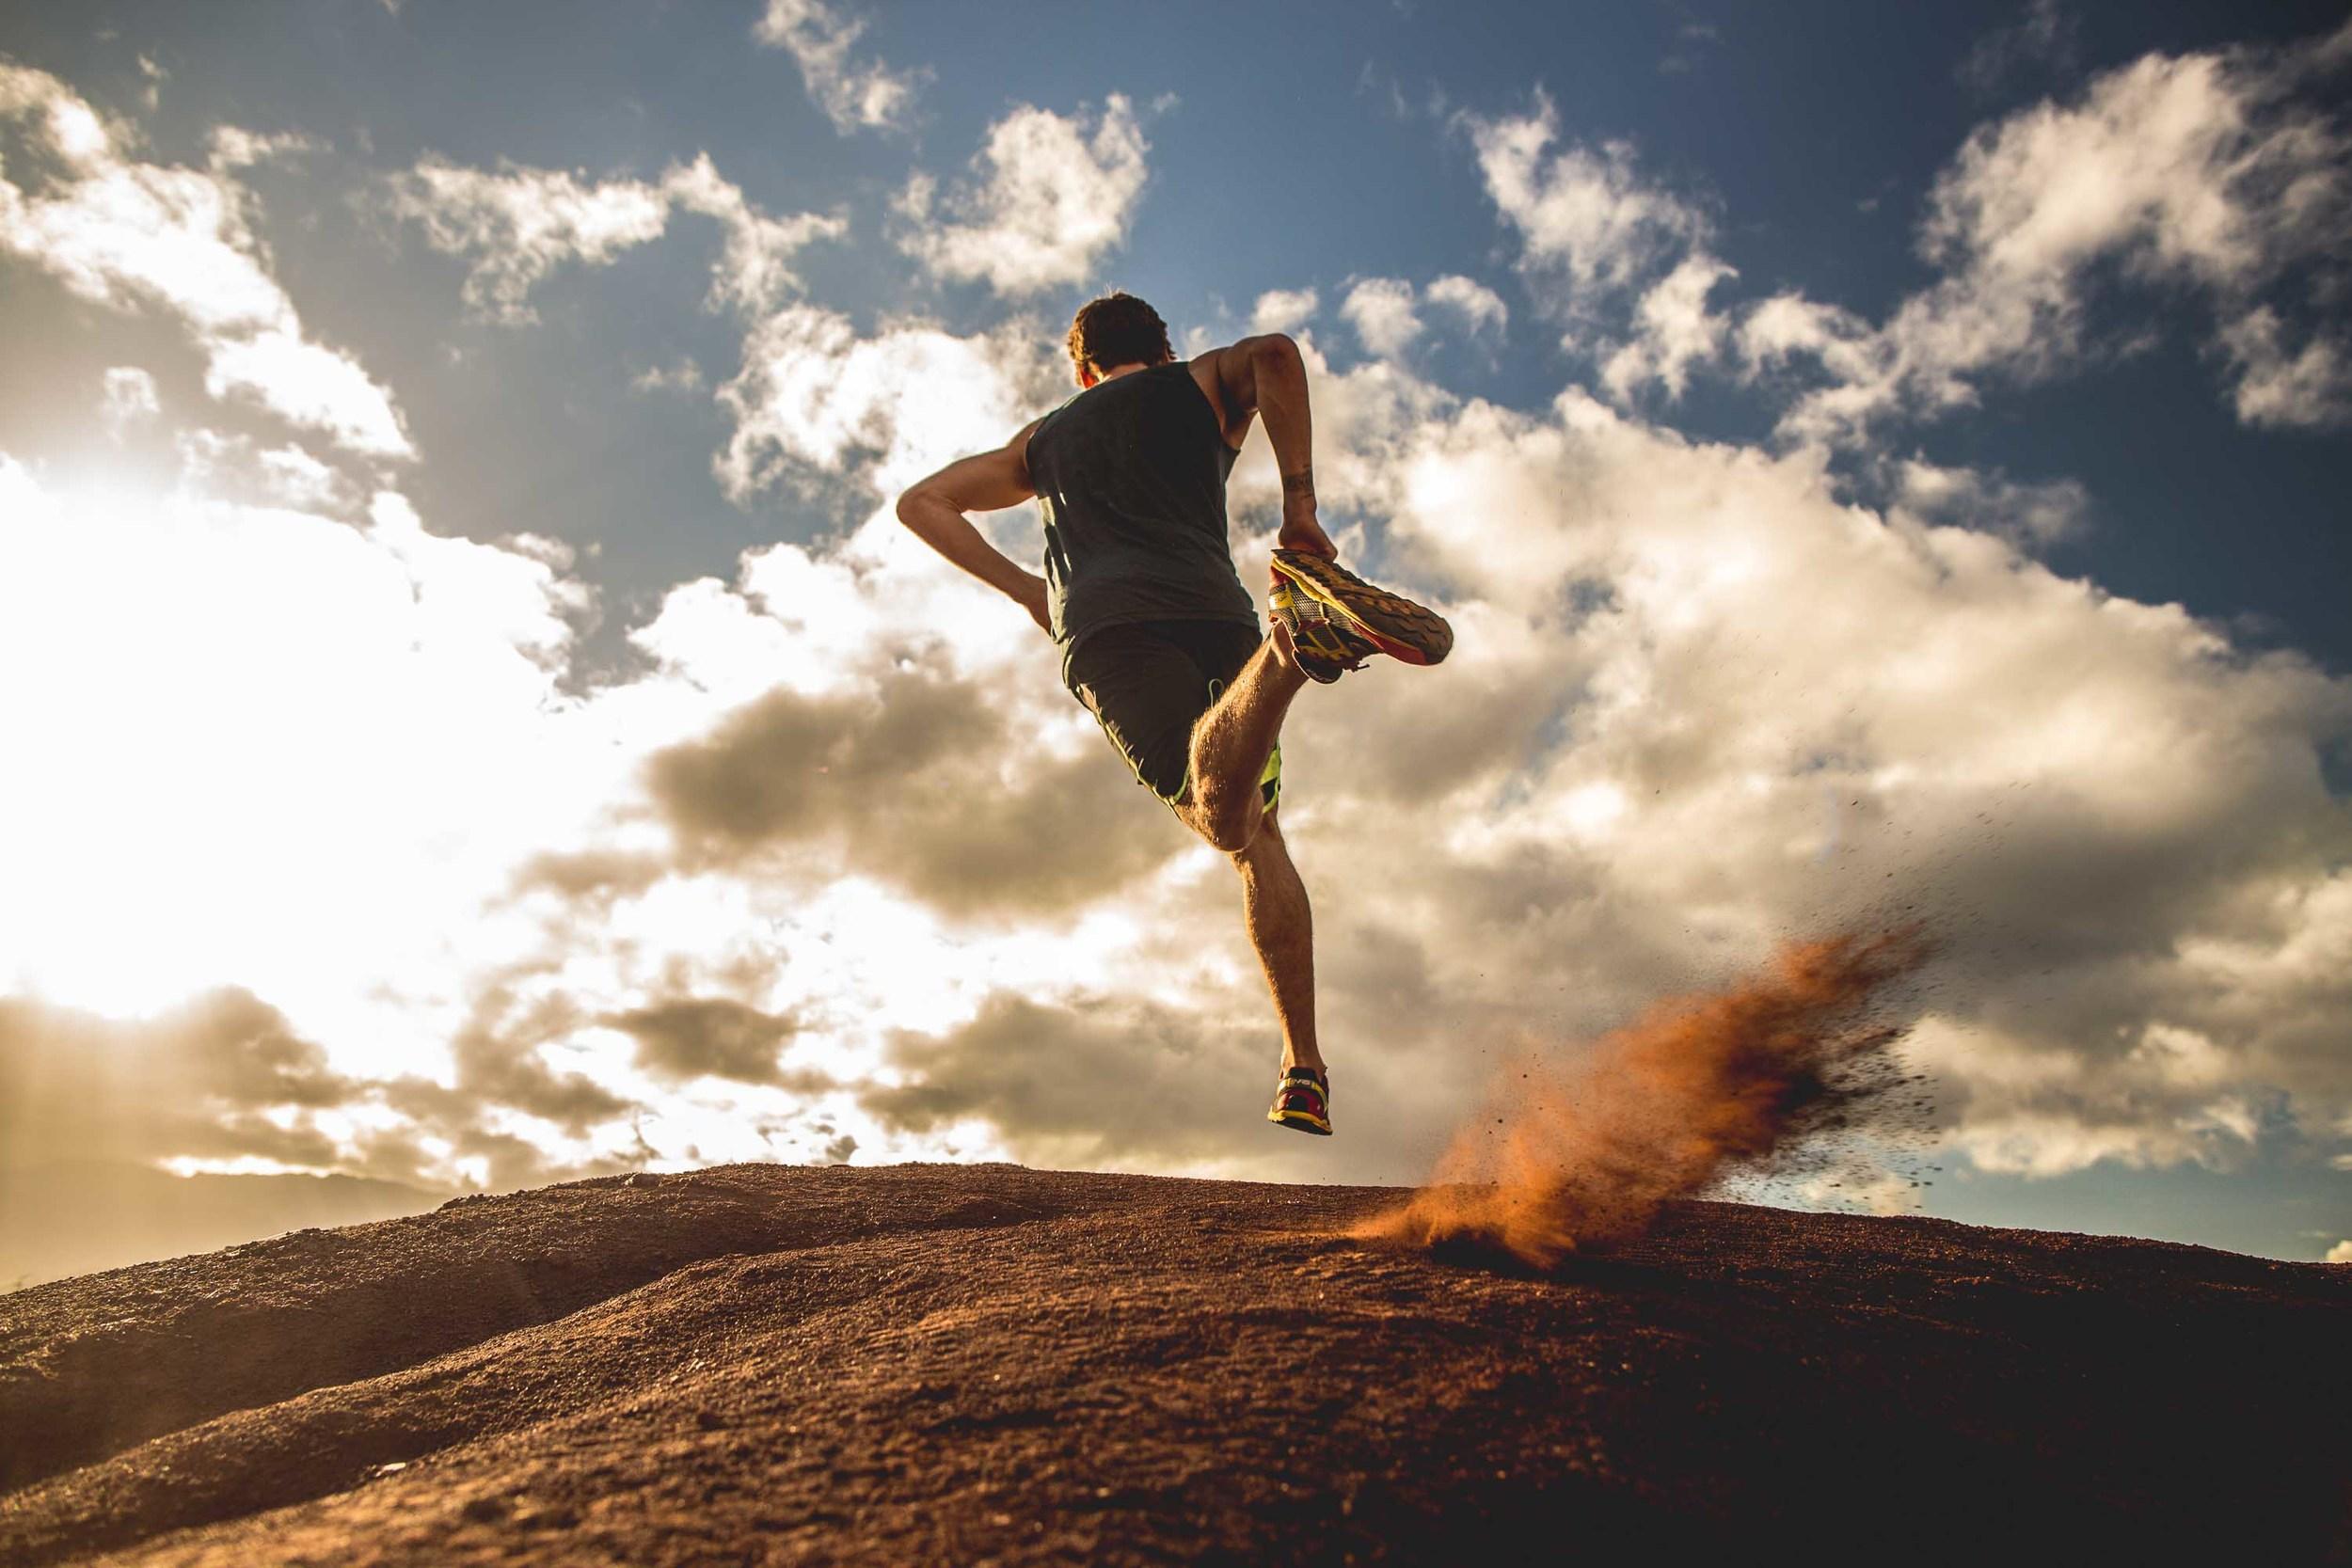 bryce-johnson-Moving Man-running-trails-hawaii-glee-actor-jake pembrook-2.jpg